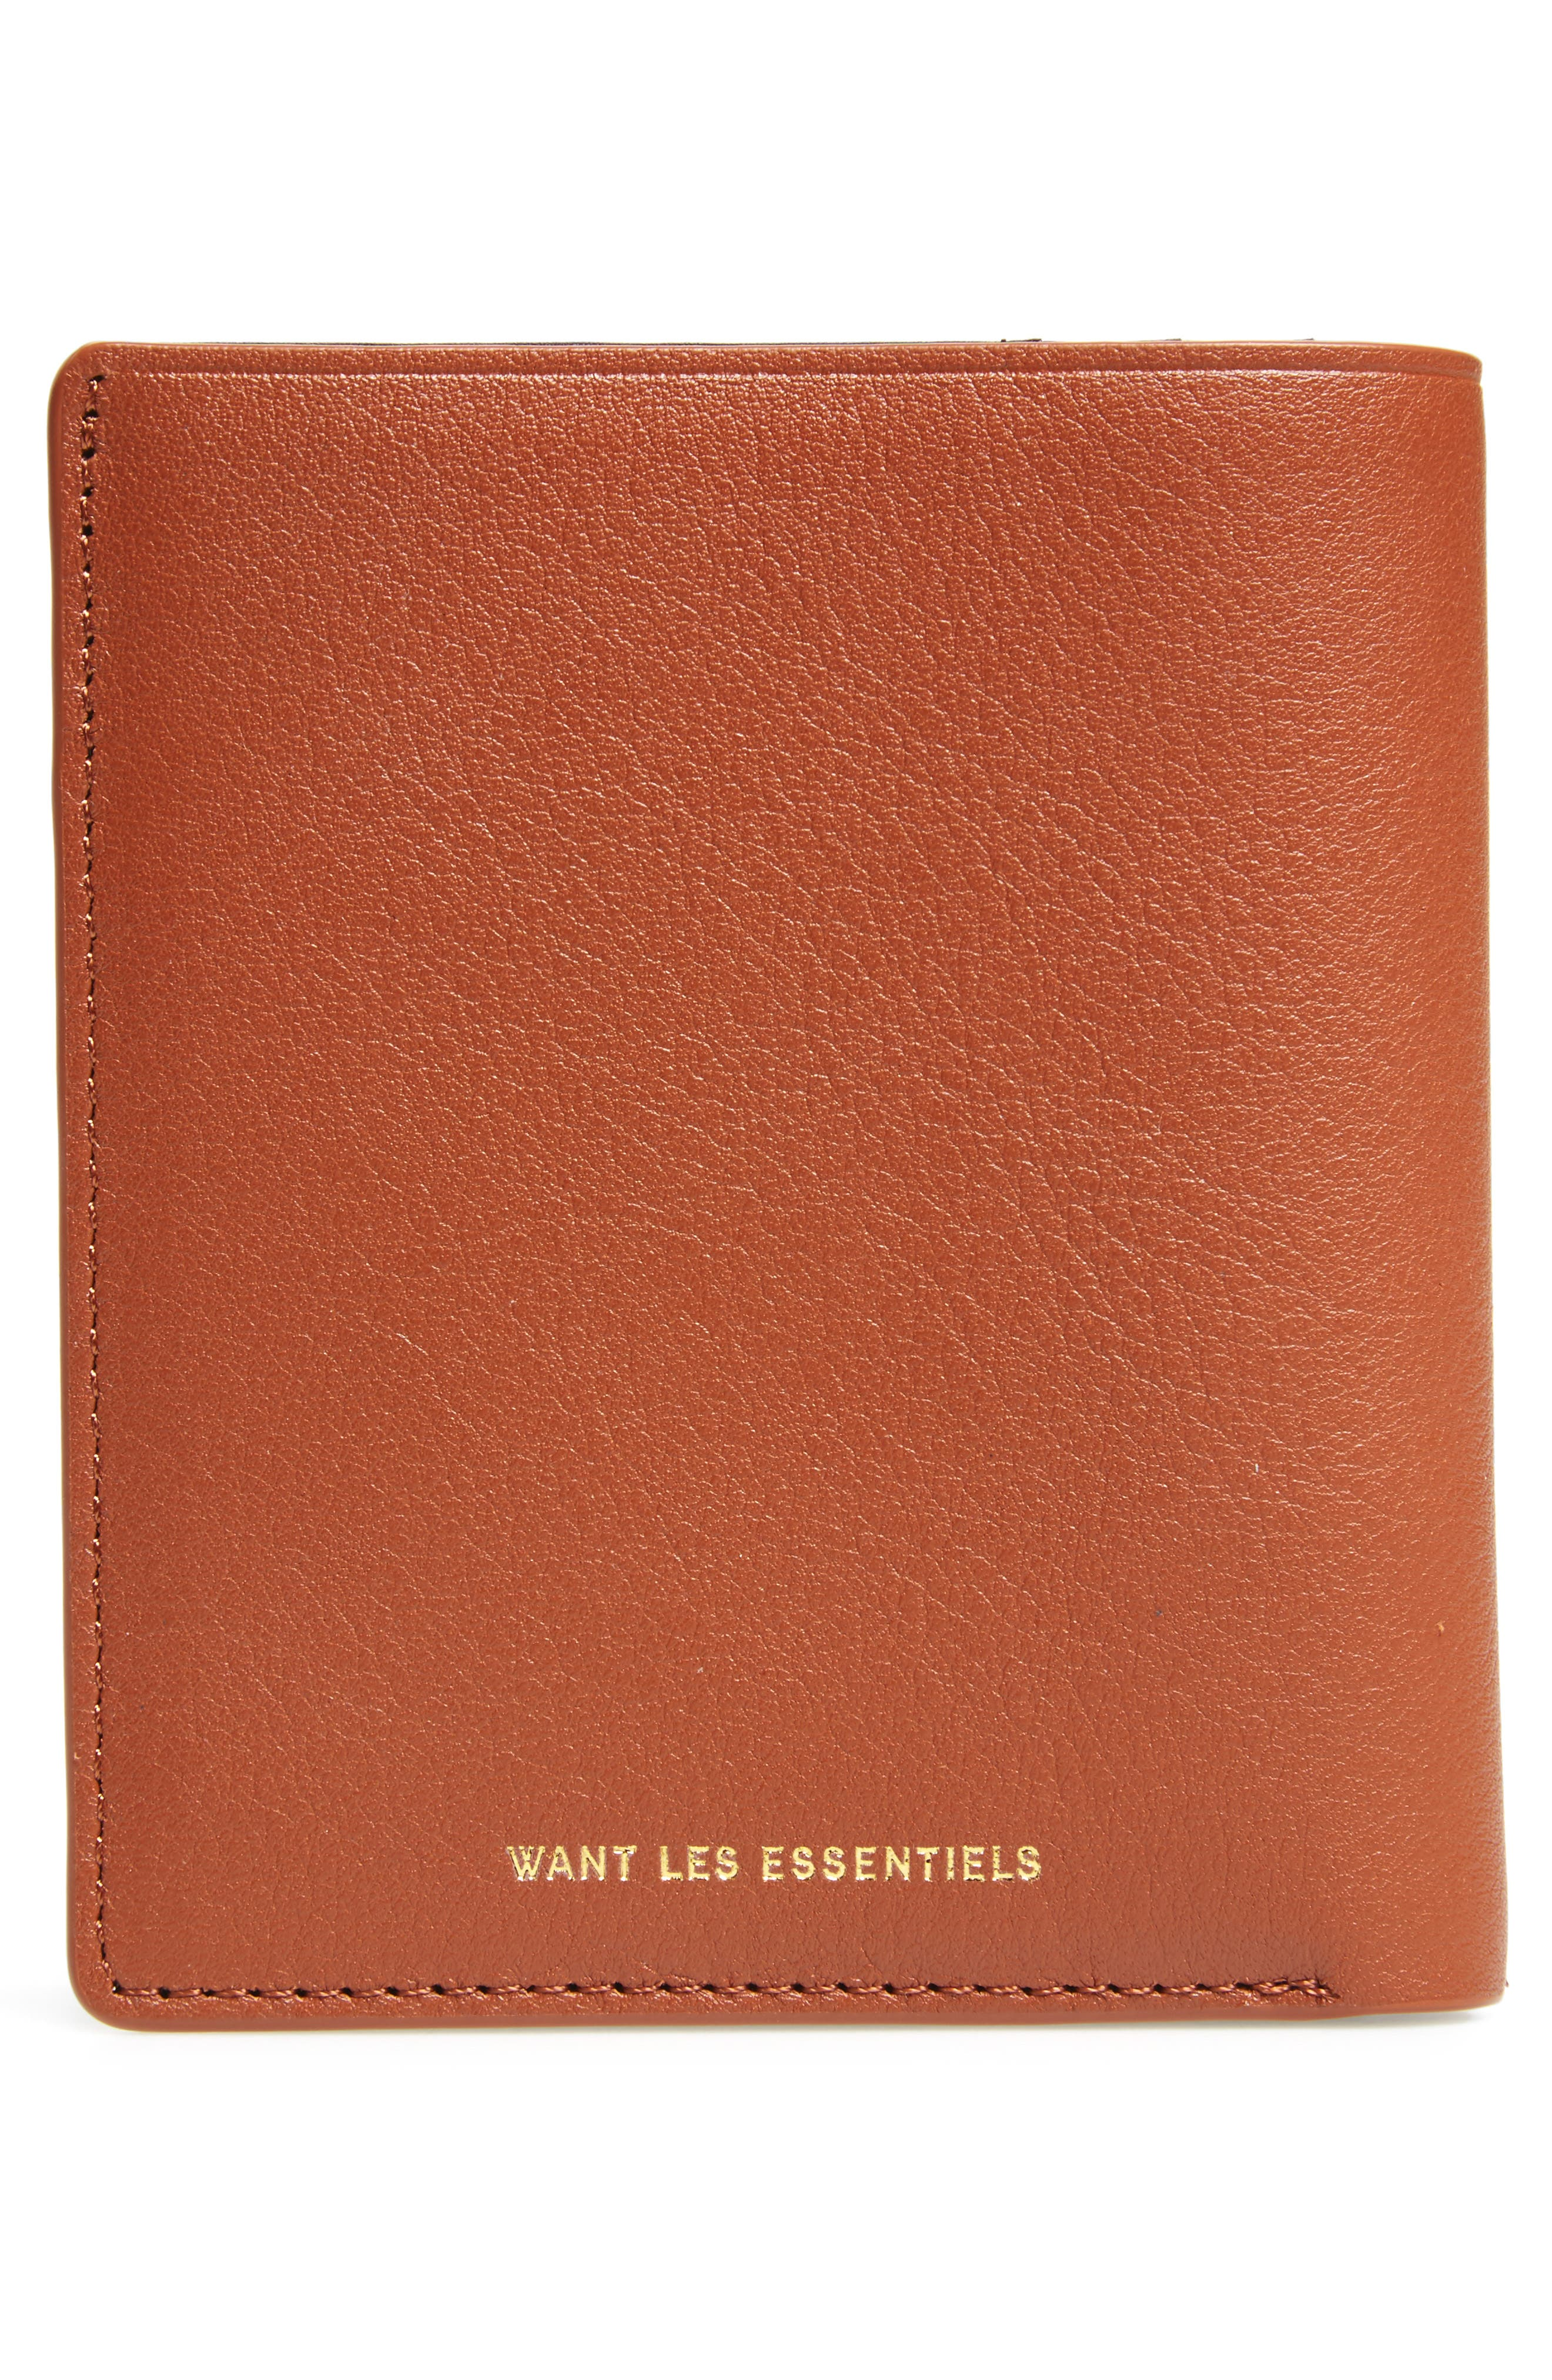 Bradley Bifold Leather Wallet,                             Alternate thumbnail 3, color,                             Multi Sand